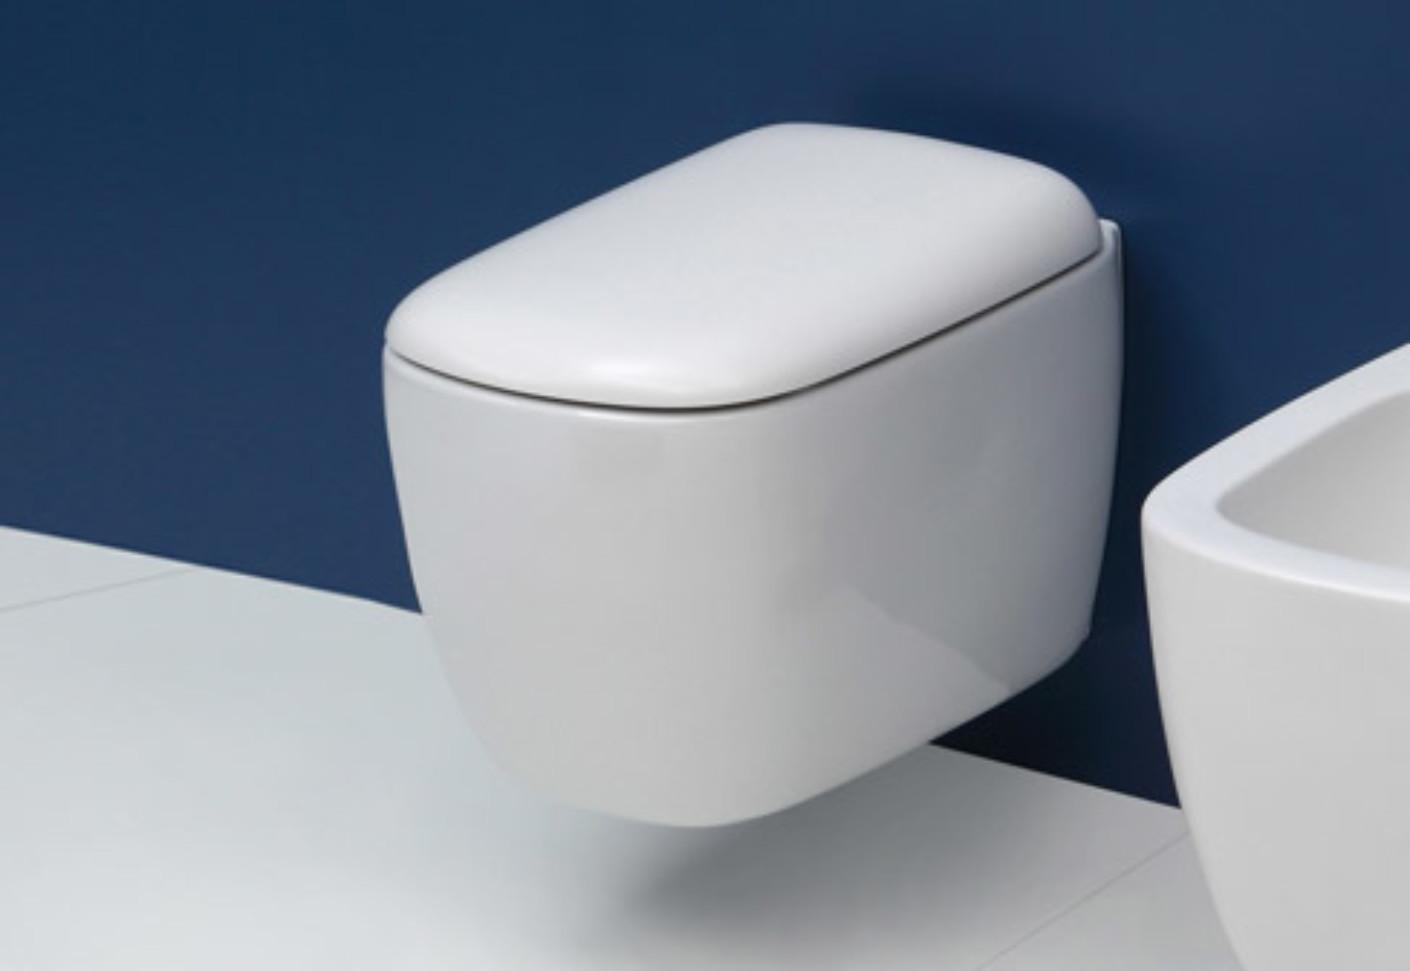 Mono Wc By Ceramica Flaminia Stylepark